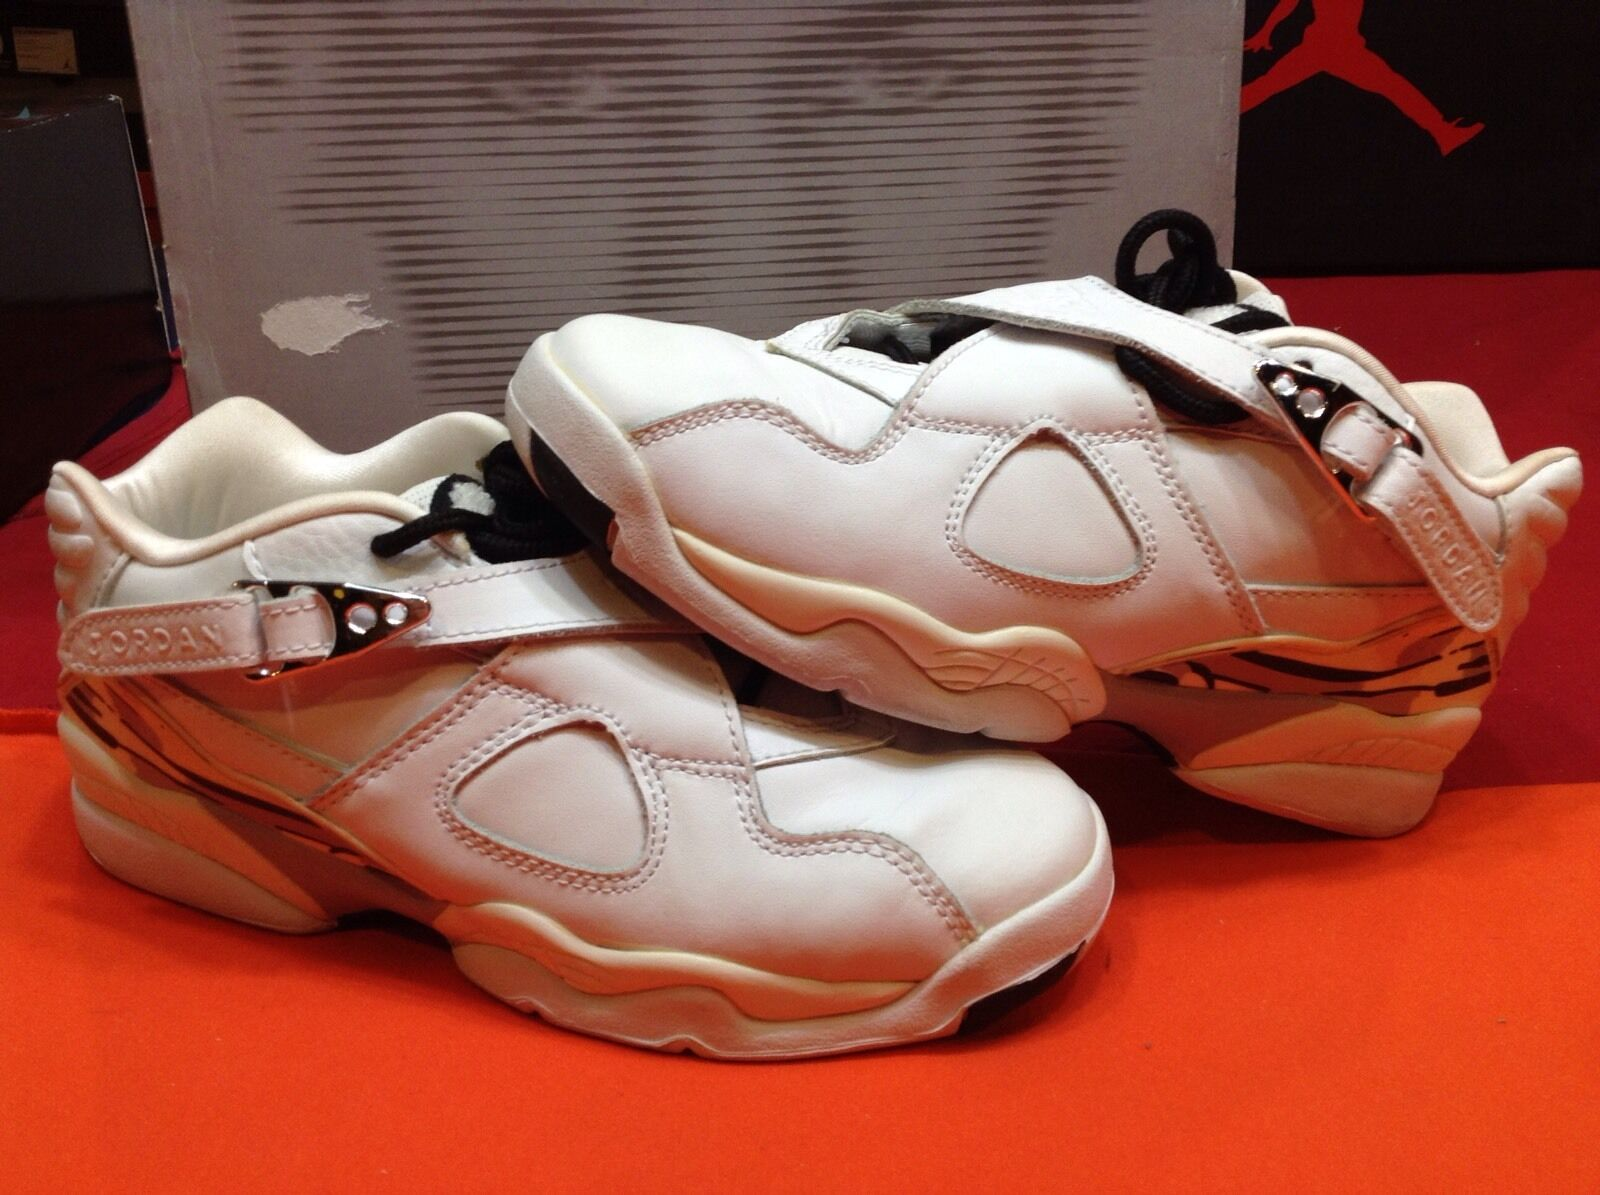 Seasonal clearance sale Nike Air Jordan Retro VIII Low GS White Chrome Silver Comfortable